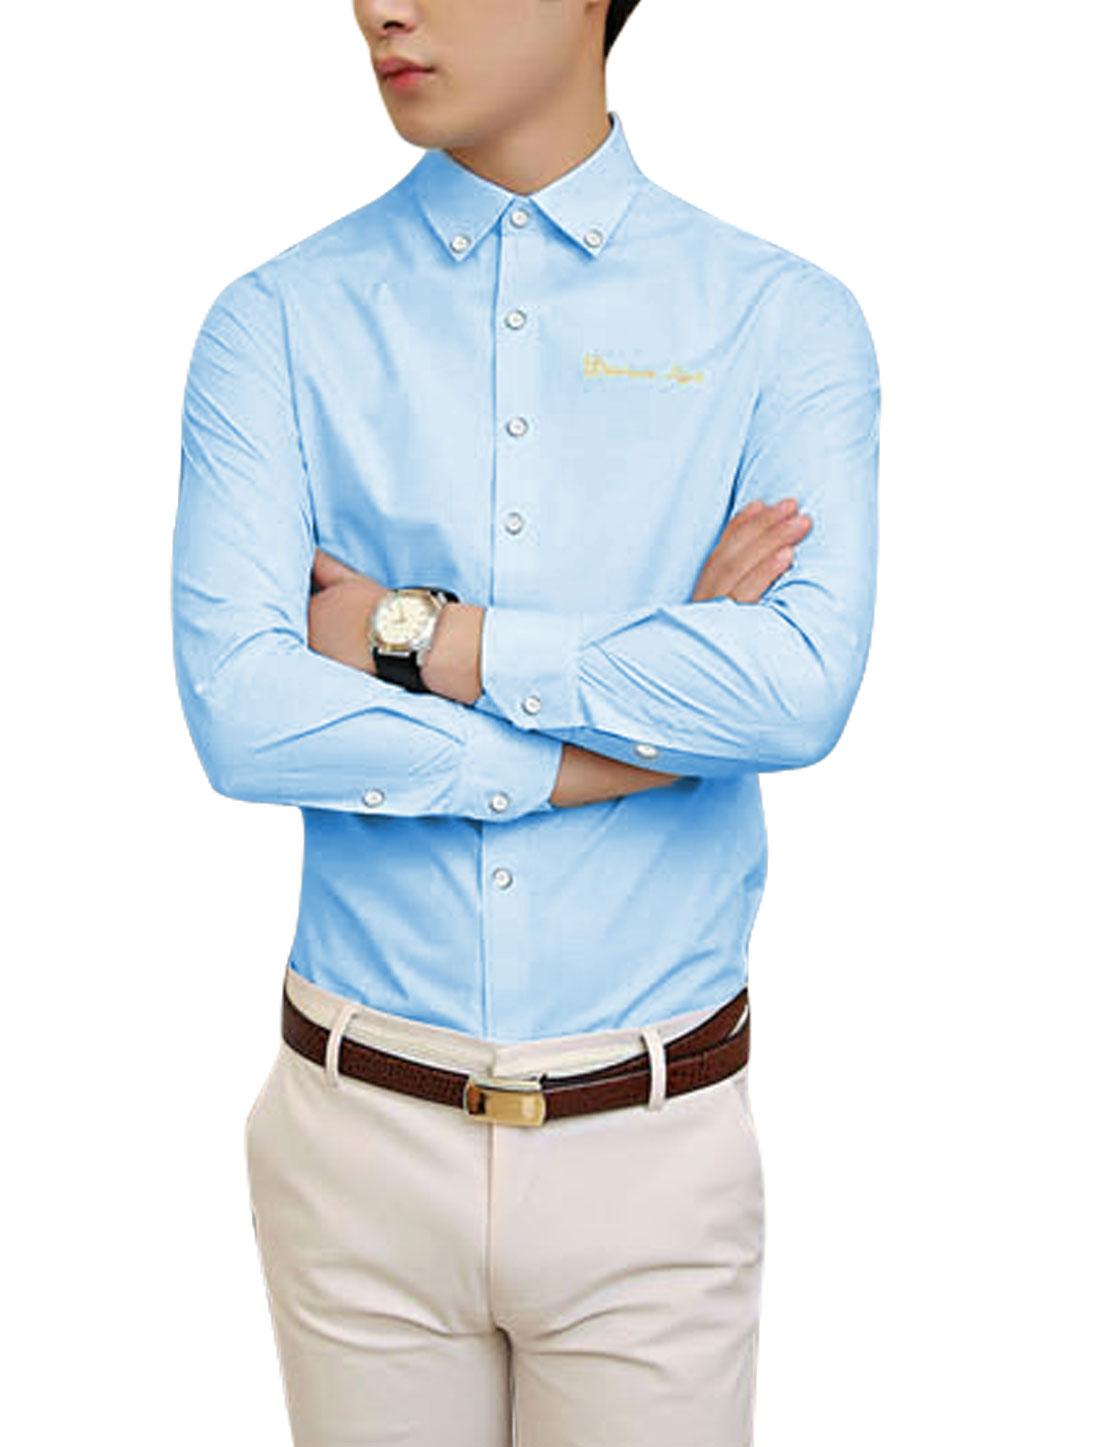 Leisure Full Sleeve Button Cuffs Sky Blue Shirt for Man M